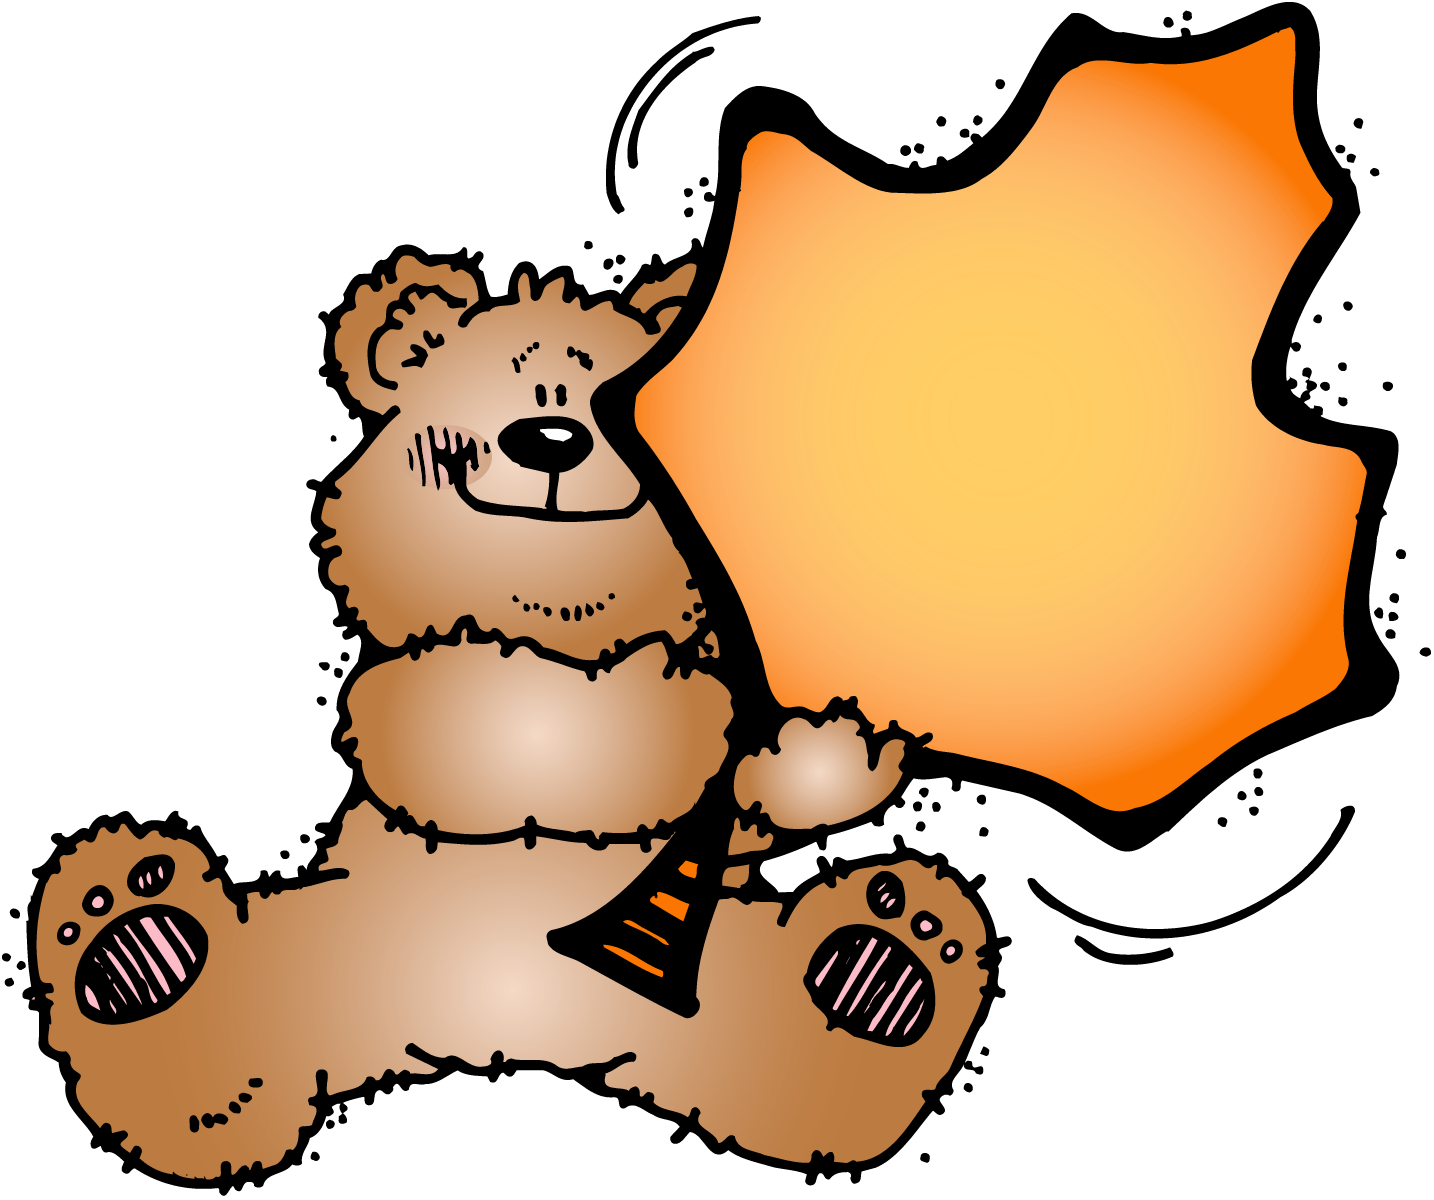 Bear with a leaf